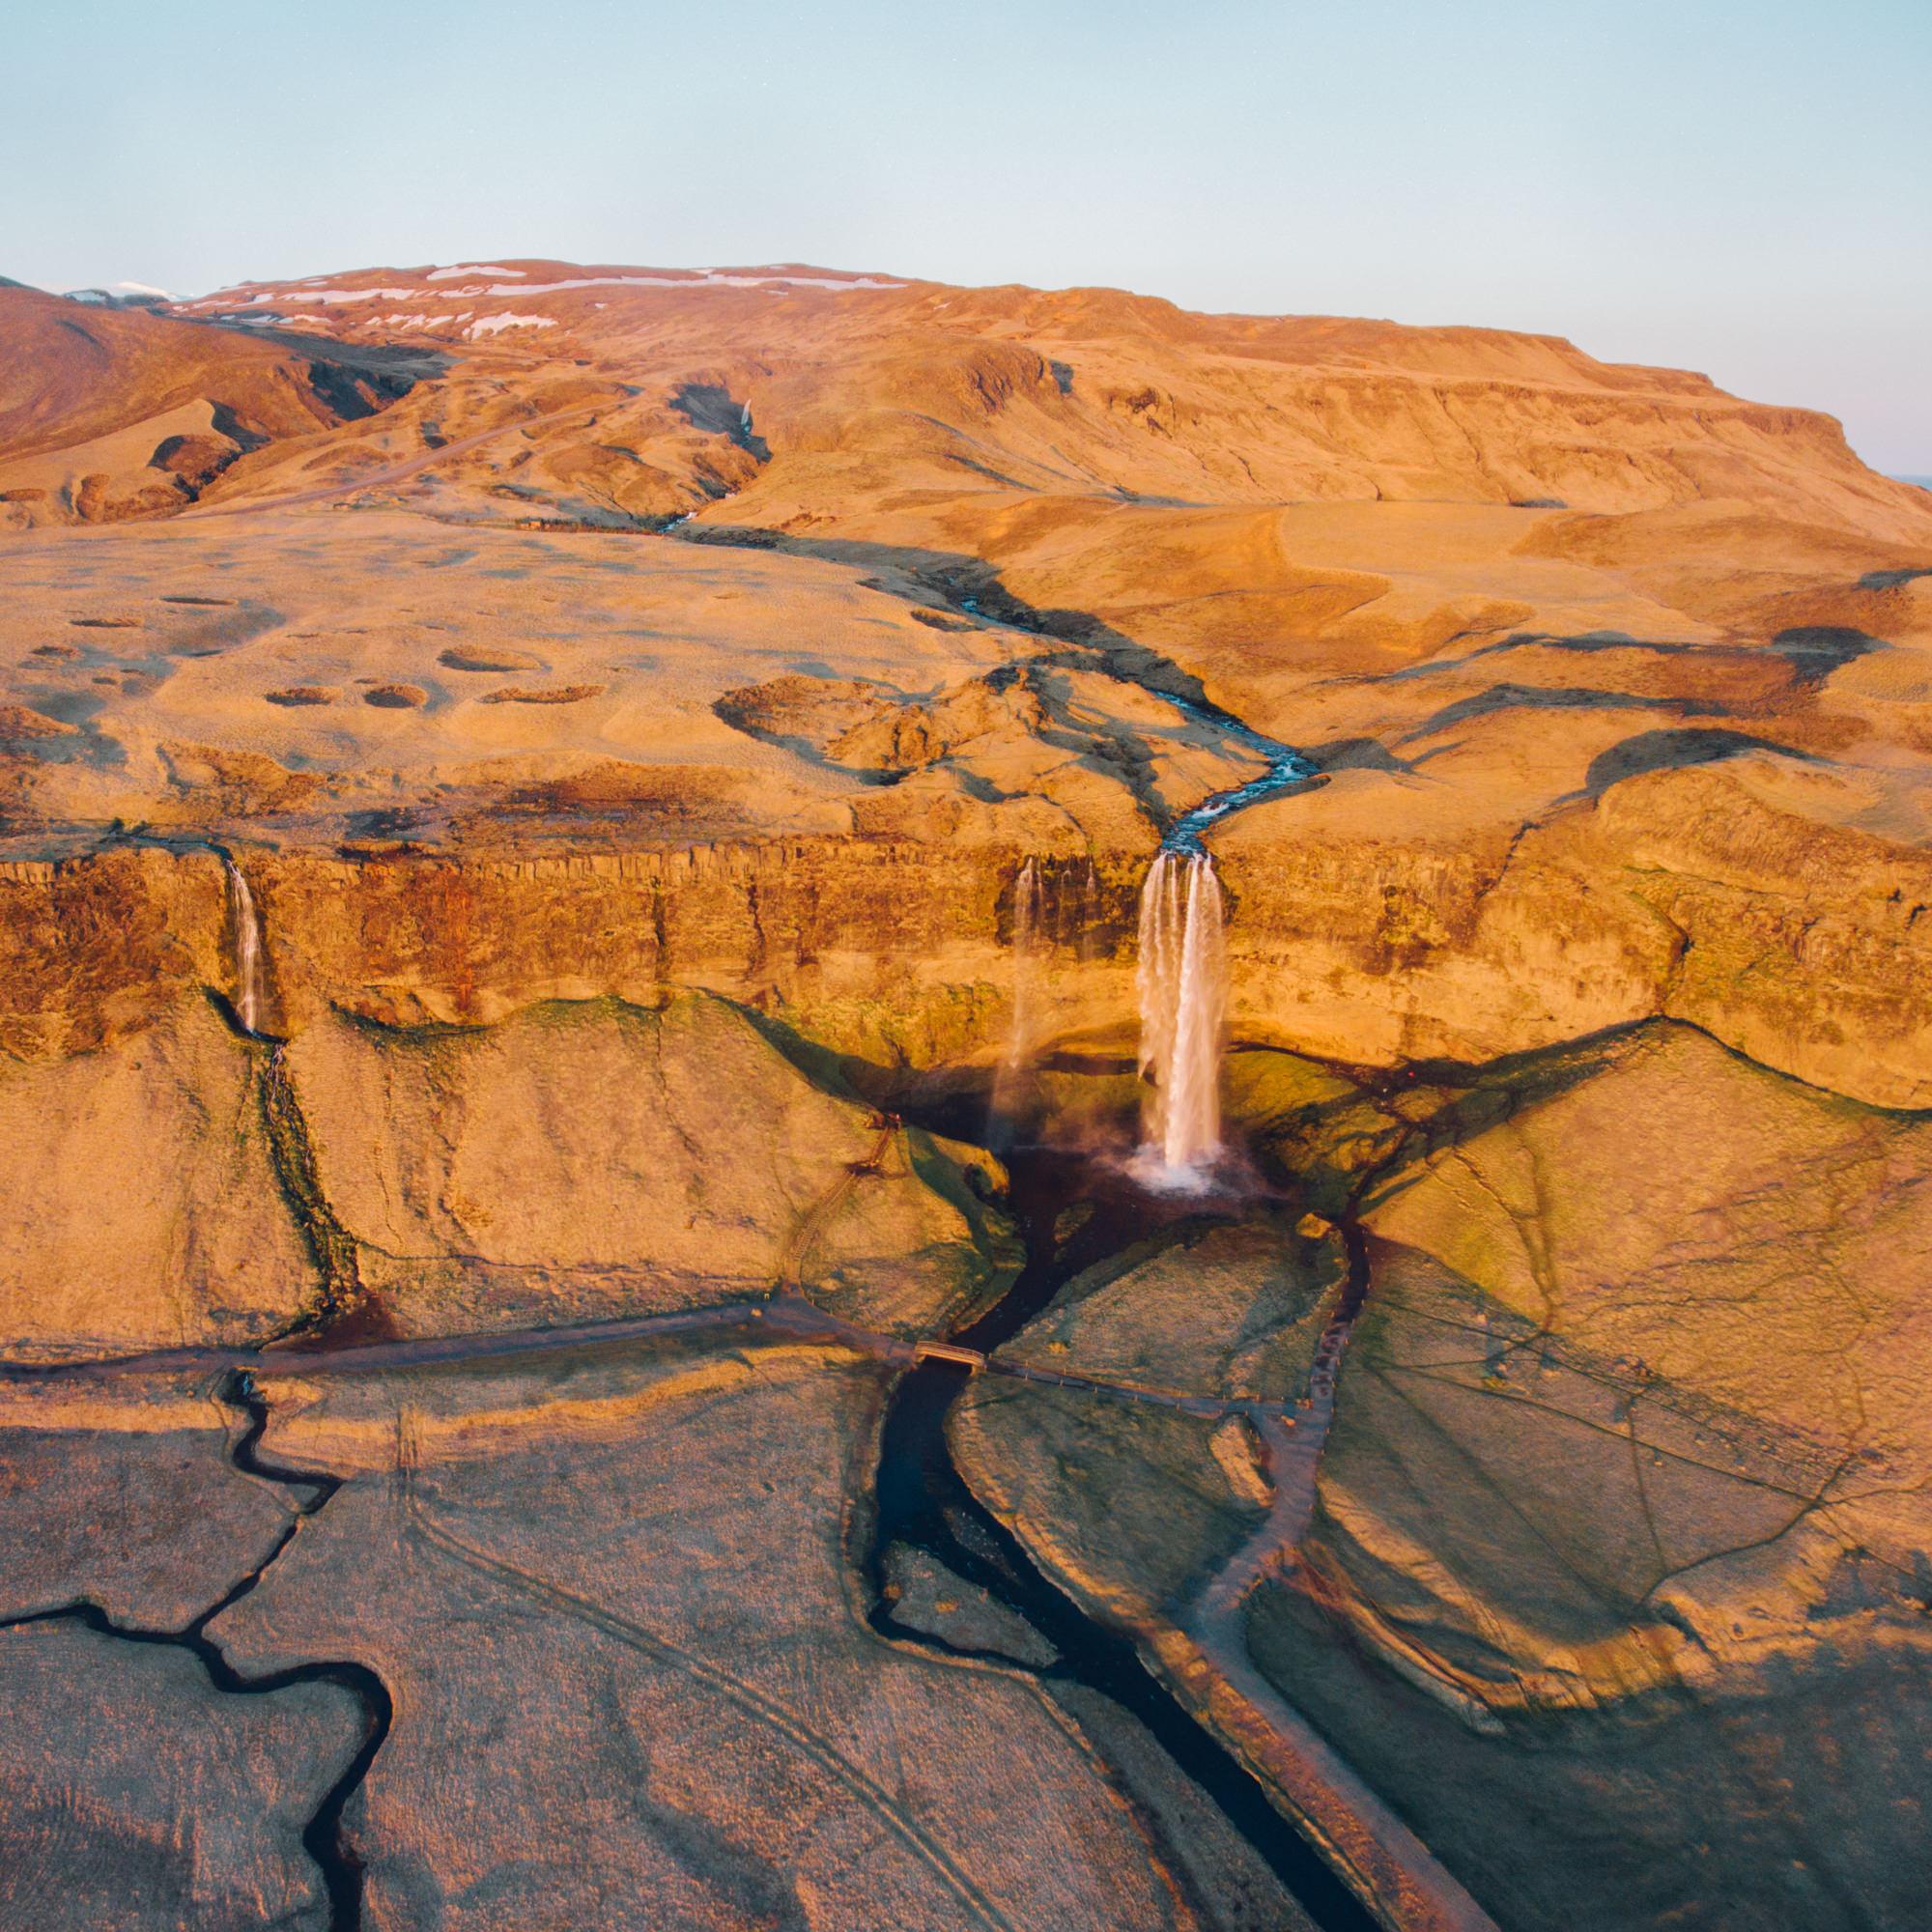 wrenee-iceland-part-1-31--seljalandsfoss-sunset-waterfall-drone.jpg